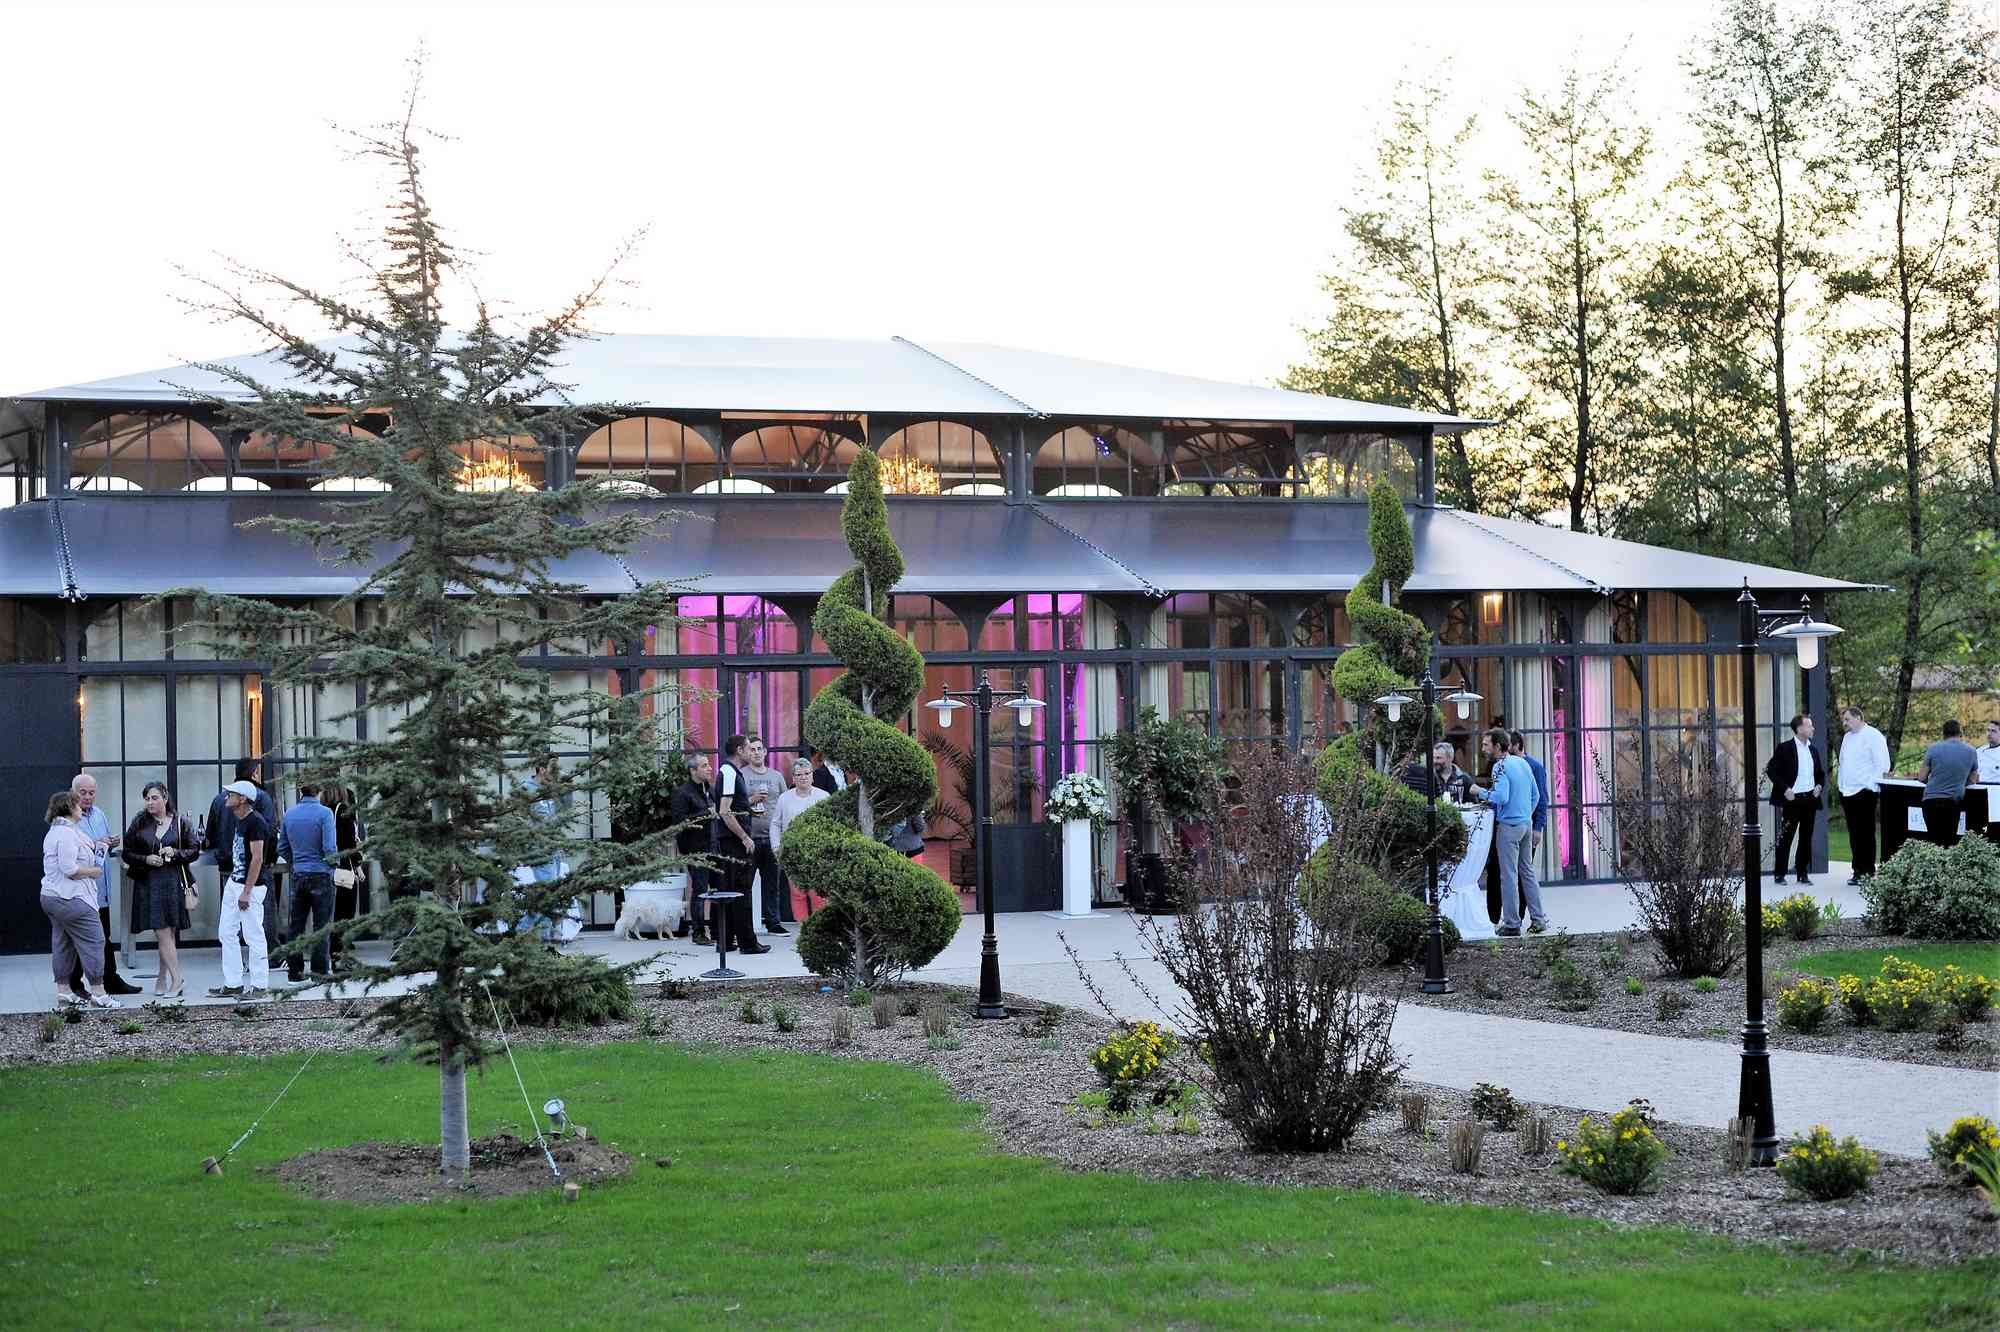 https://www.mulhou.se/wp-content/uploads/2019/09/Orangerie-Mariage-Mulhouse.jpg